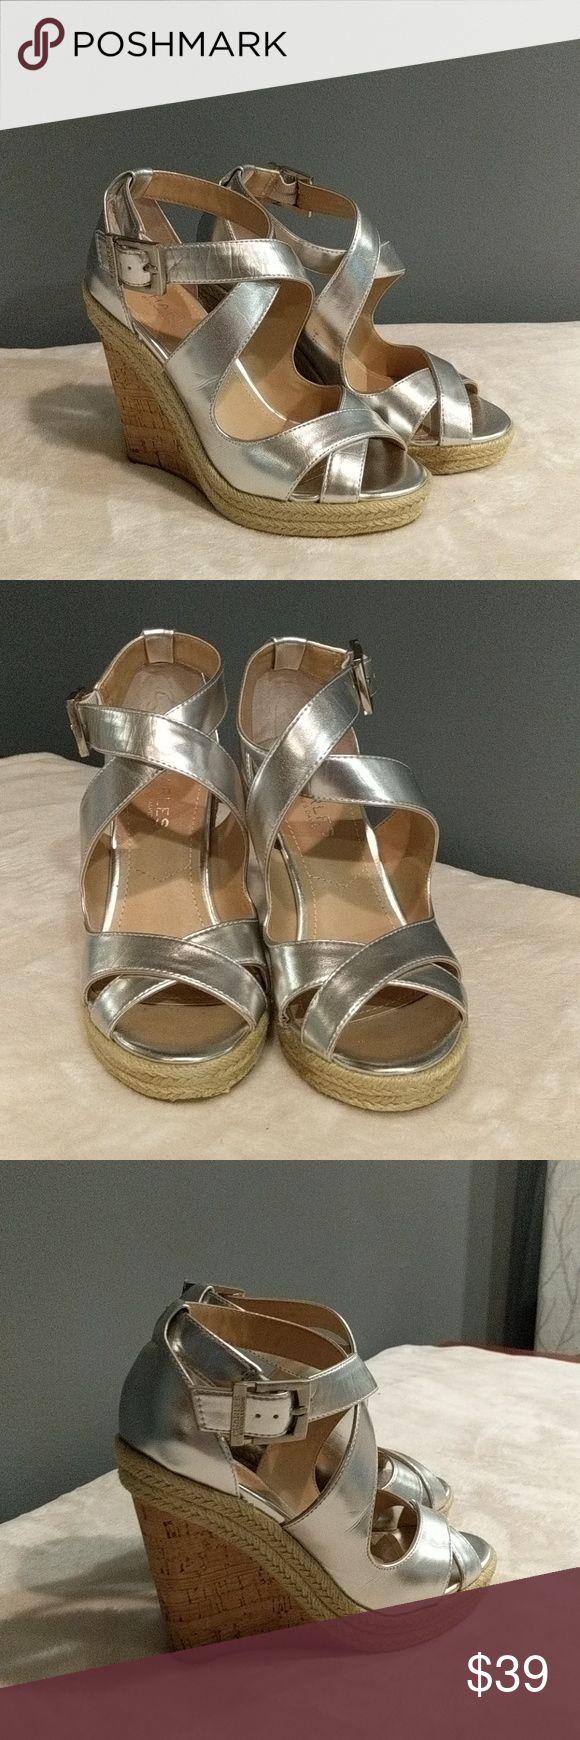 Charles by Charles David platform heels Charles David platform heel. Silver with cork platform heel. New. Charles David Shoes Platforms